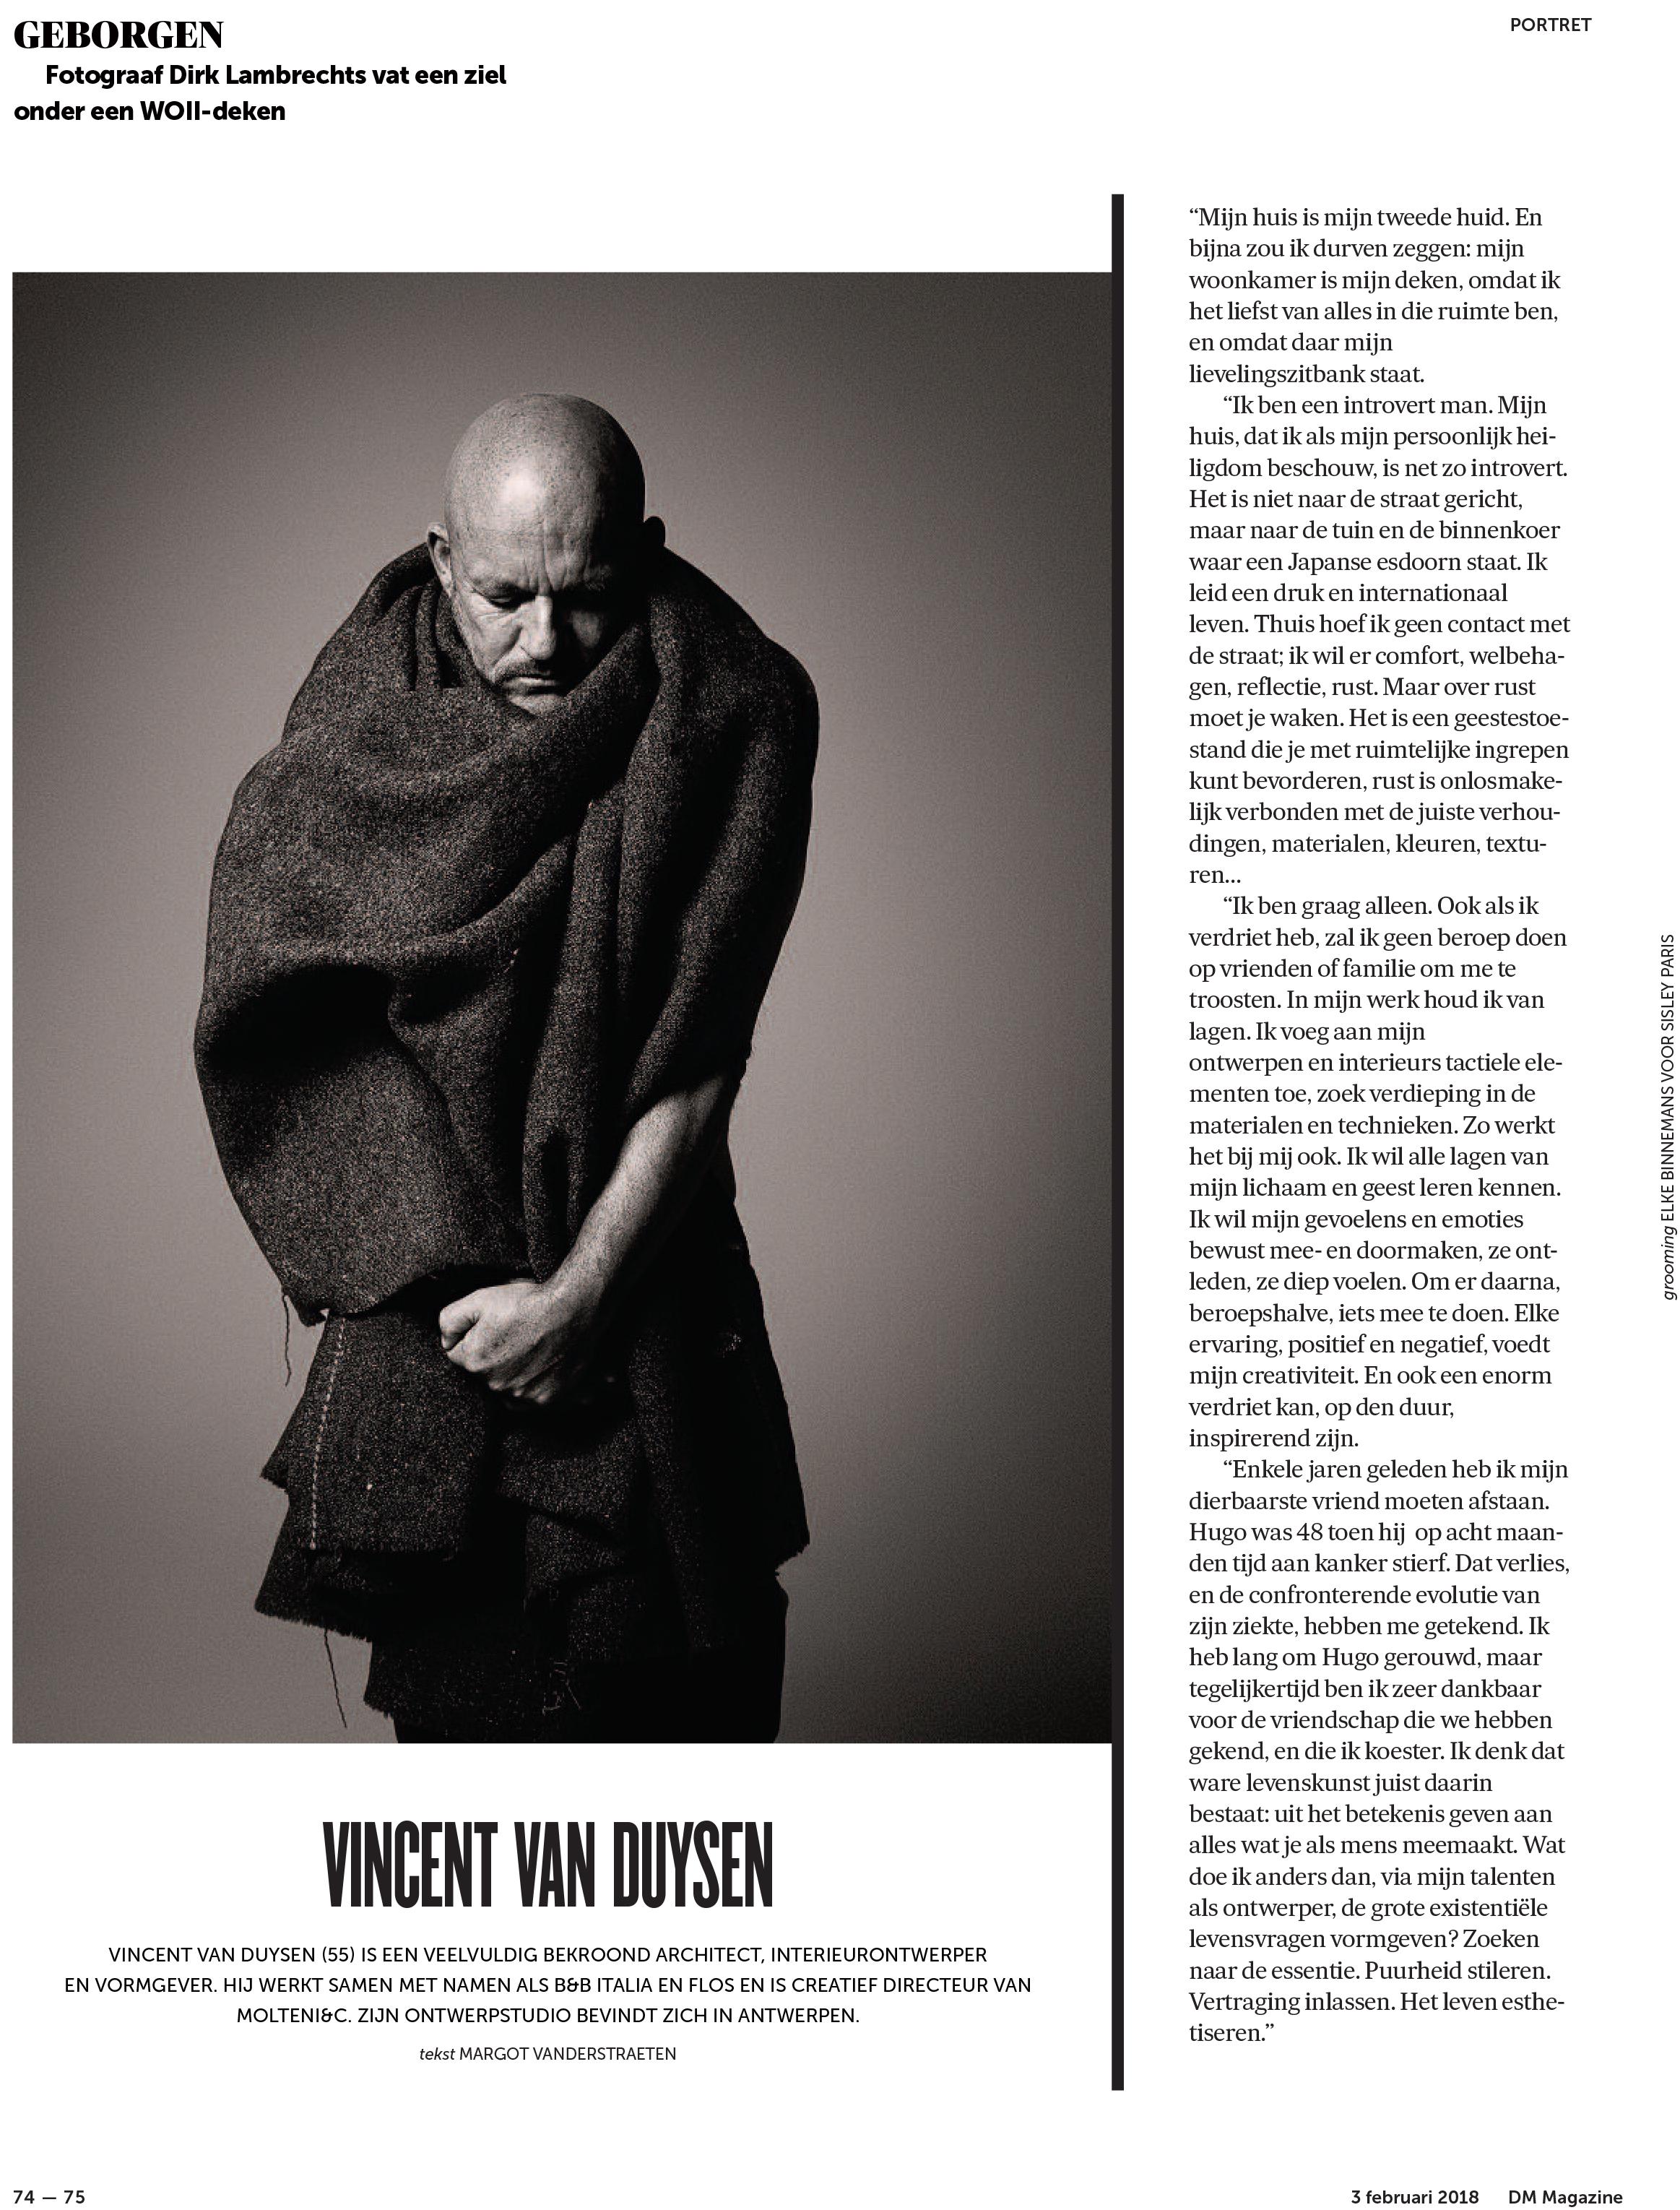 PUB_2018_De Morgen Magazine_Vincent Van Duysen